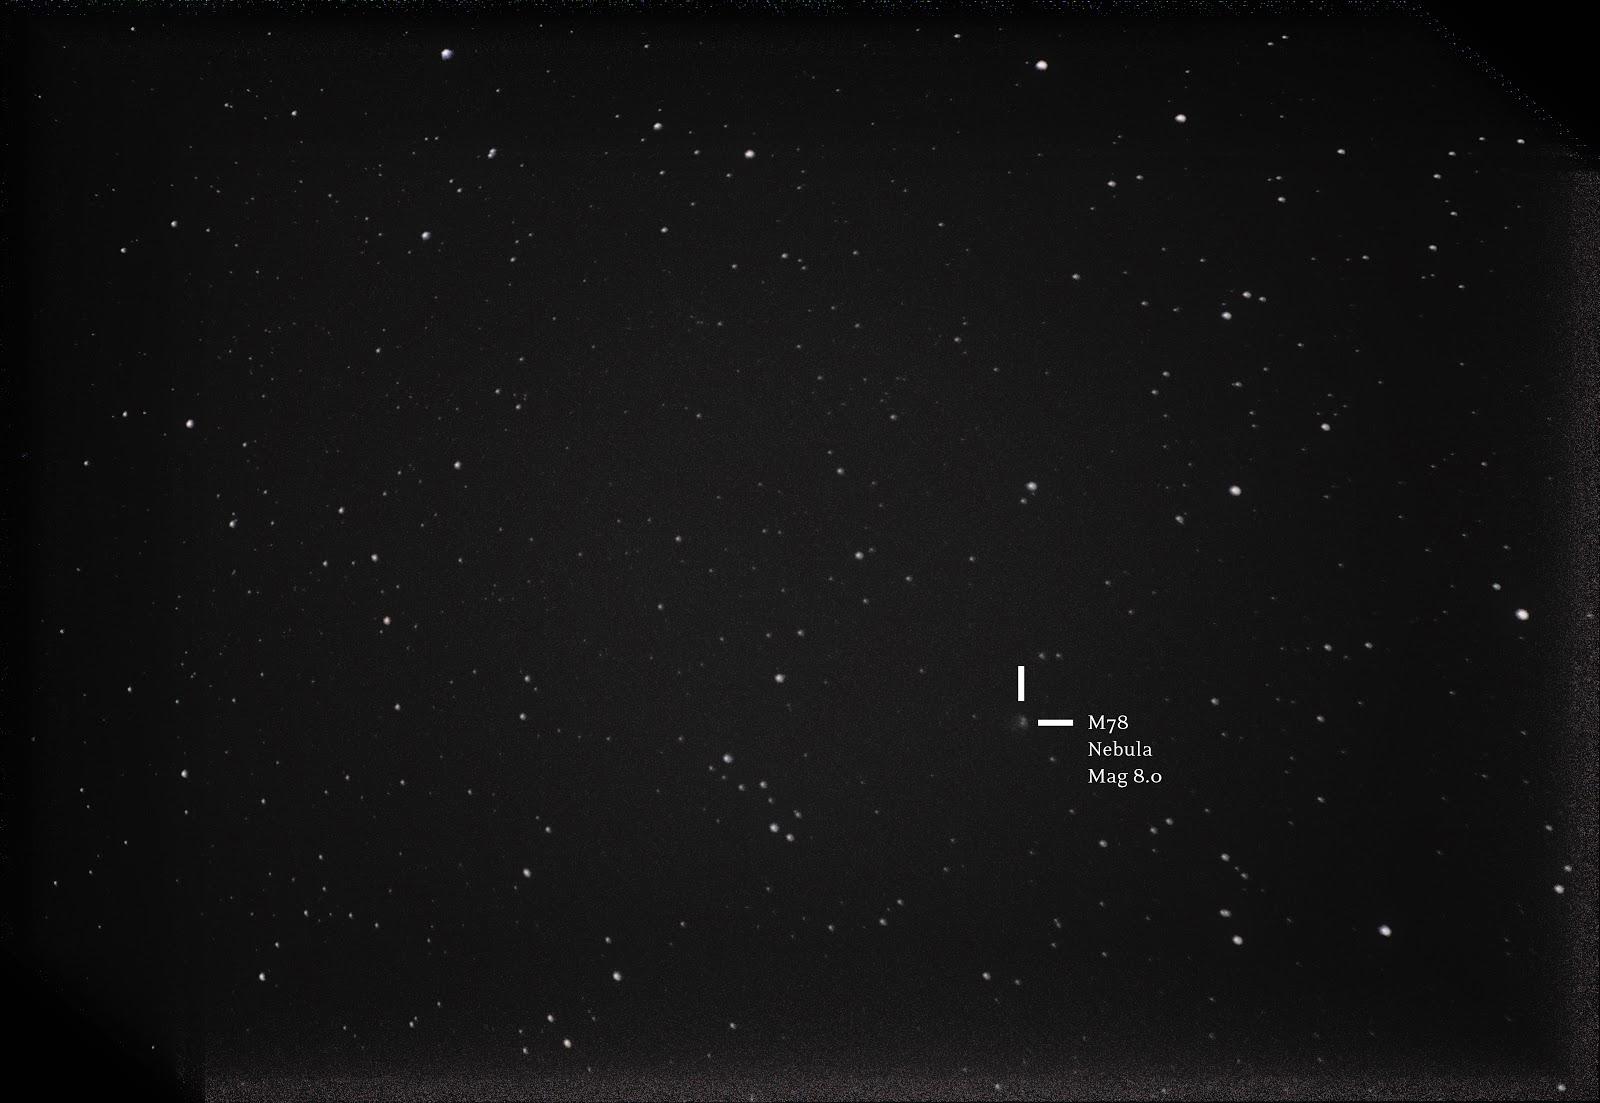 M78 Messier 78